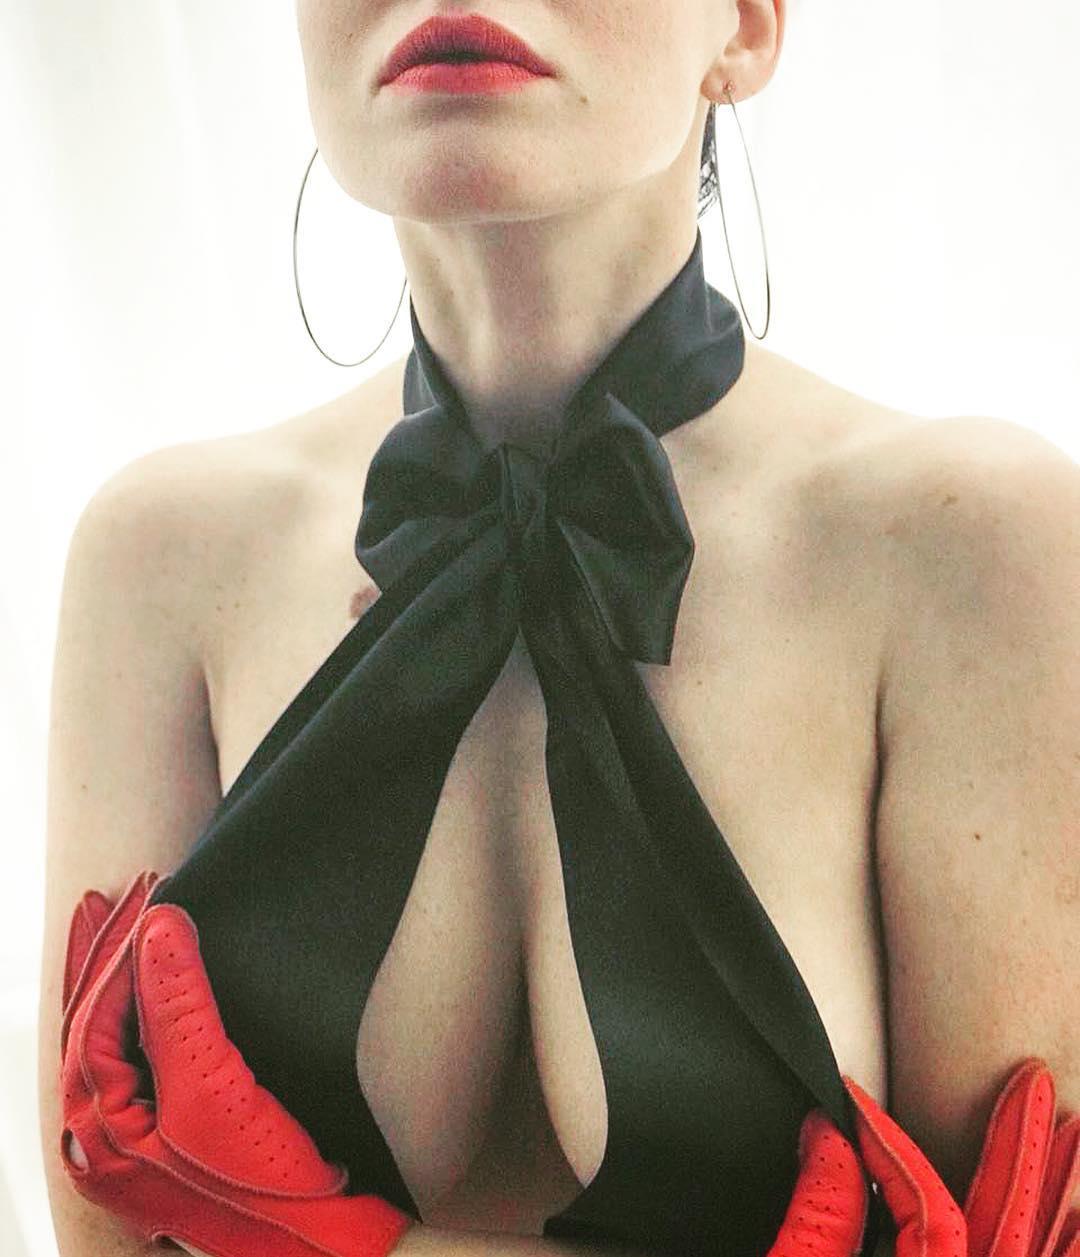 Даша Астафьева: Start of #stanDArt #backstage #Mua & #hairstyle @yevgeniyakozlova #outfit @tebyanezhdem #agent & @photo @anna_gurban